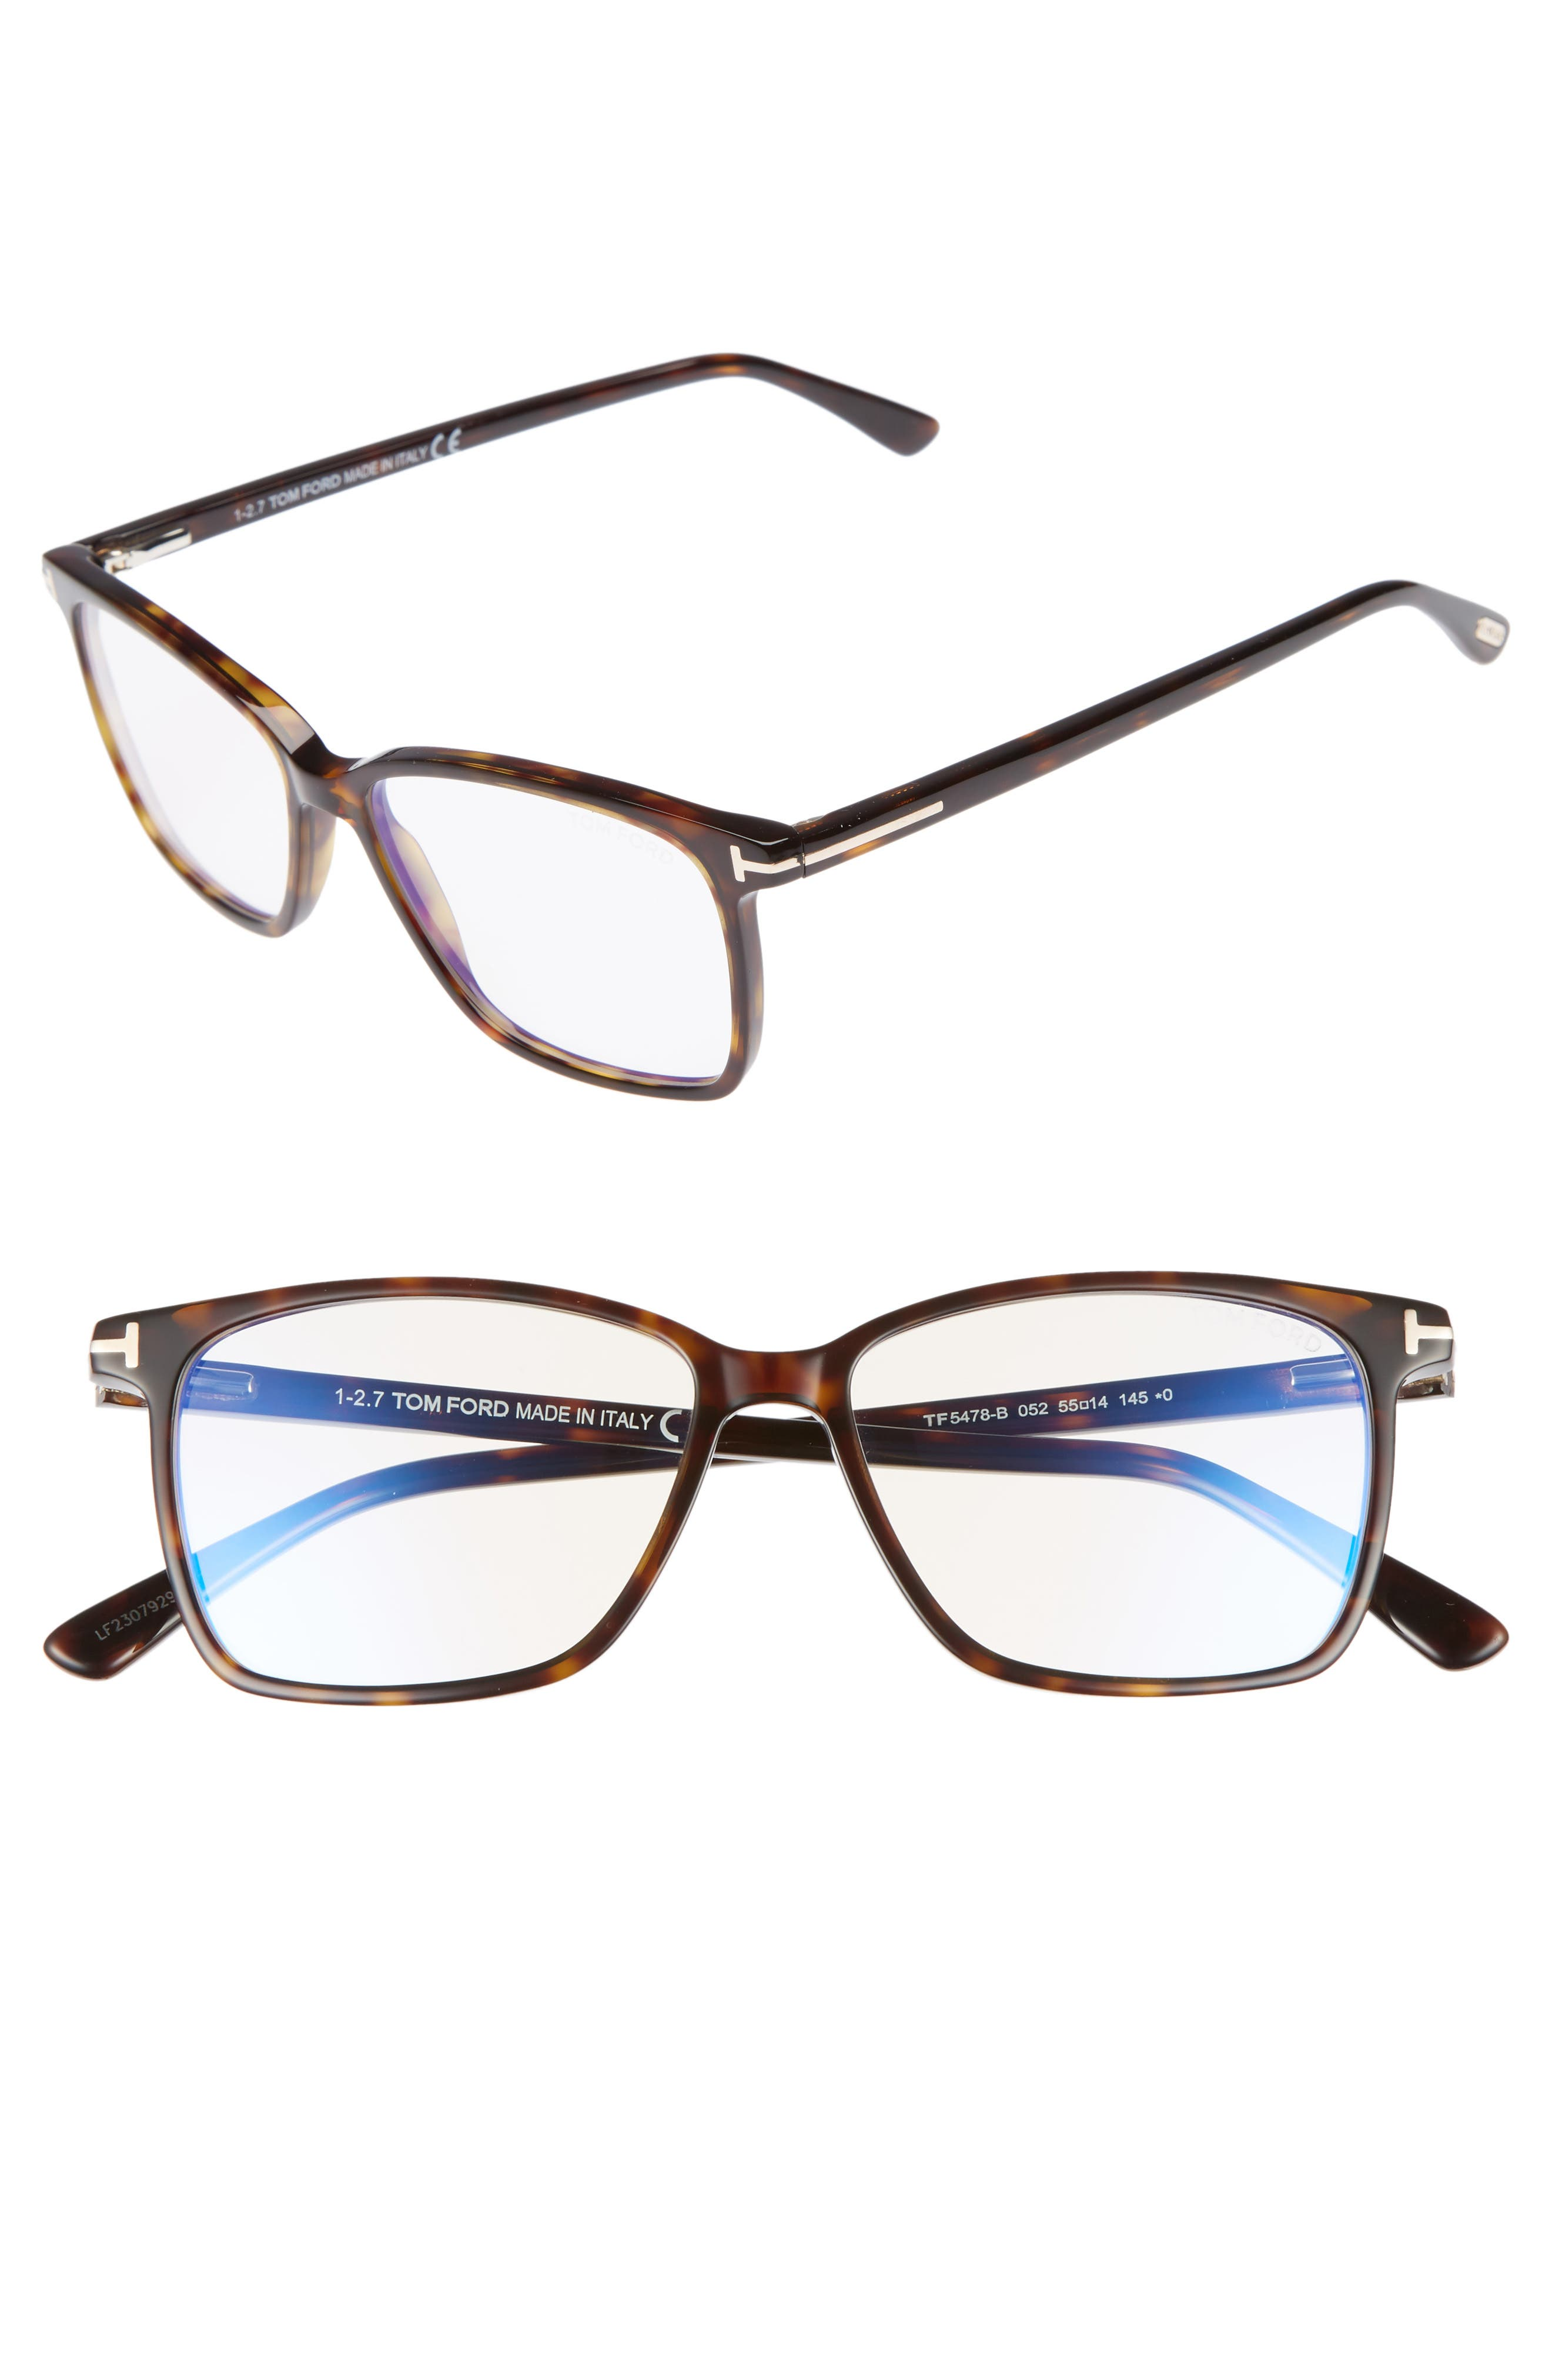 55mm Blue Block Optical Glasses,                         Main,                         color, DARK HAVANA/ BLUE